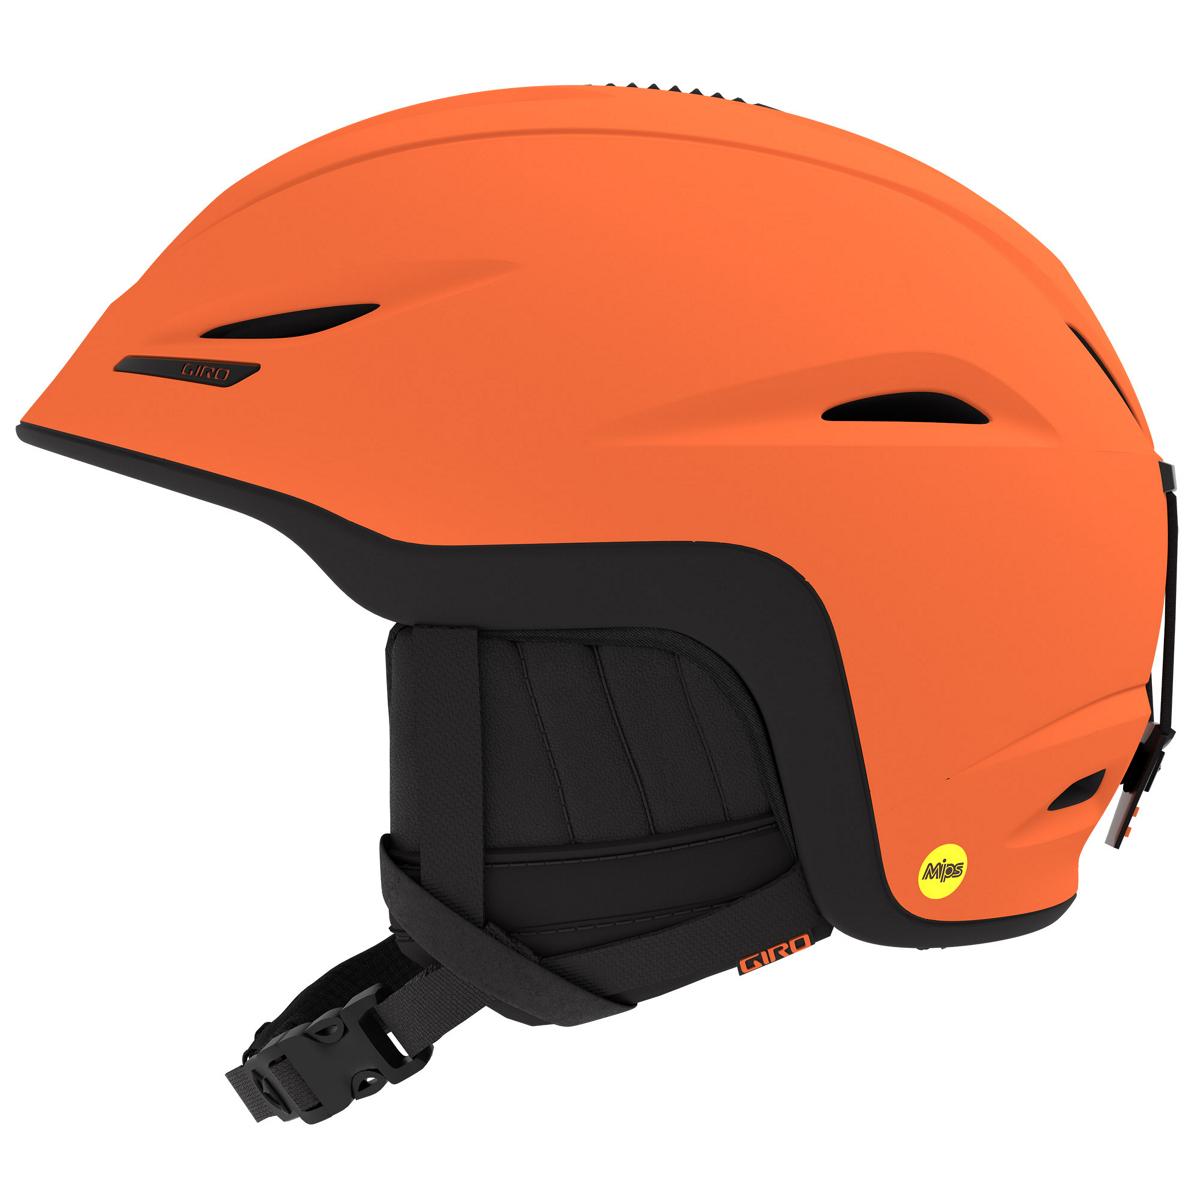 Giro Union MIPS Helmet - Matte Bright Orange